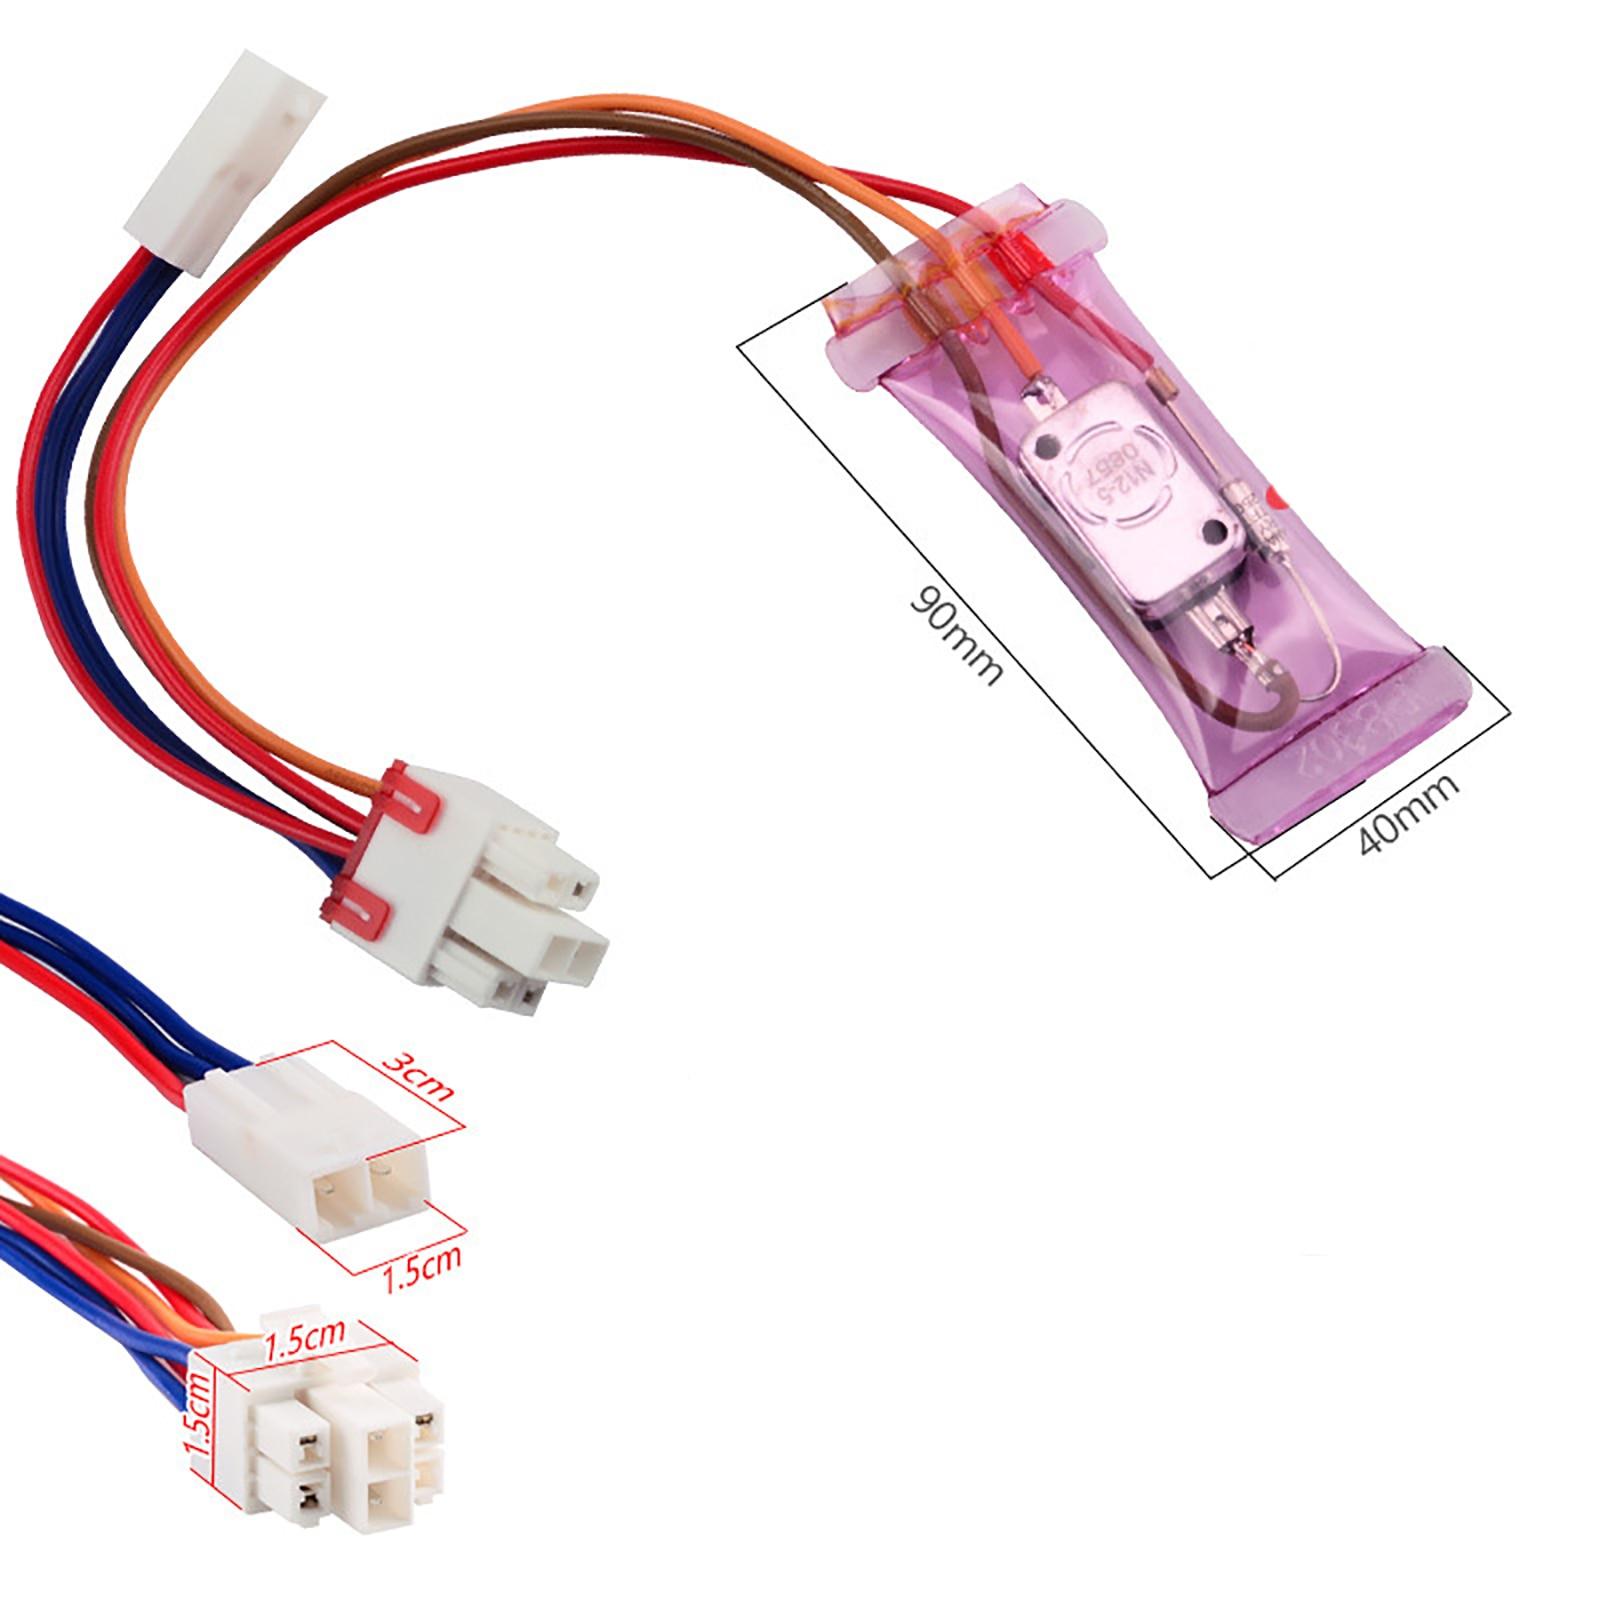 14 Celsius Degree AC 250V 10A 3 Wire 1PCS Refrigerator Defrost Thermostat NO